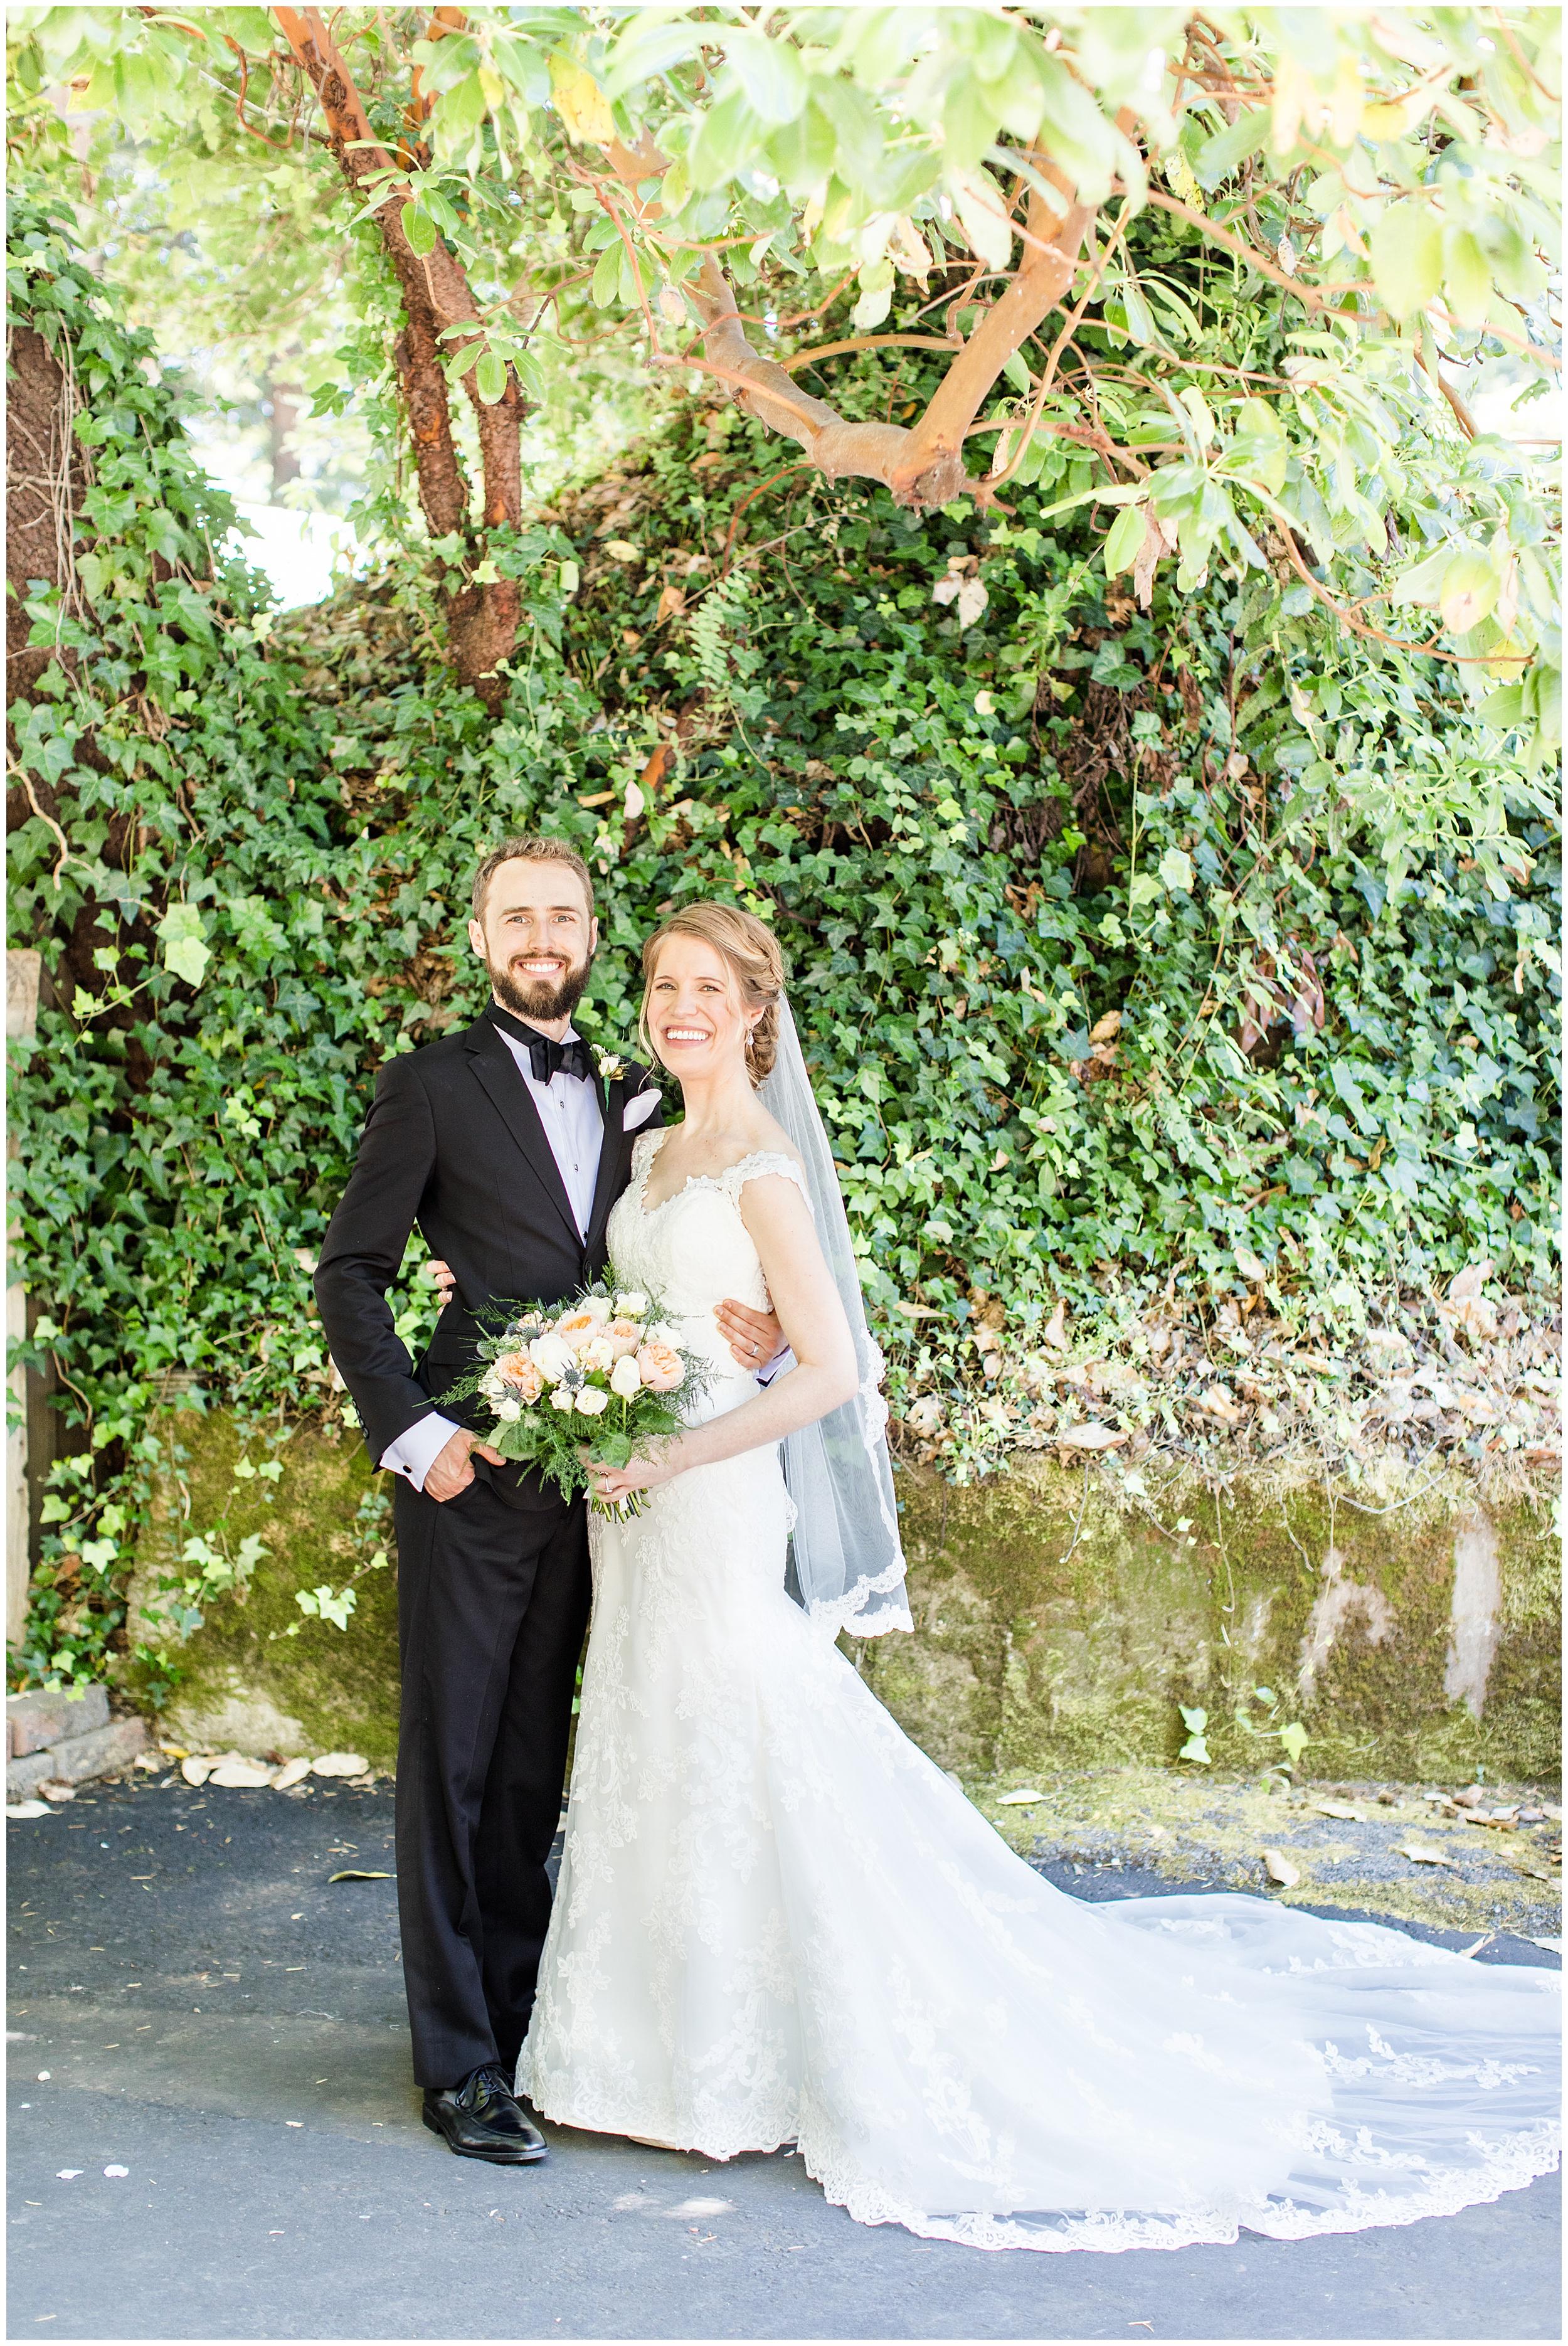 2019 chapel on the hill los gatos san jose bay area wedding photographer angela sue photography_0046.jpg